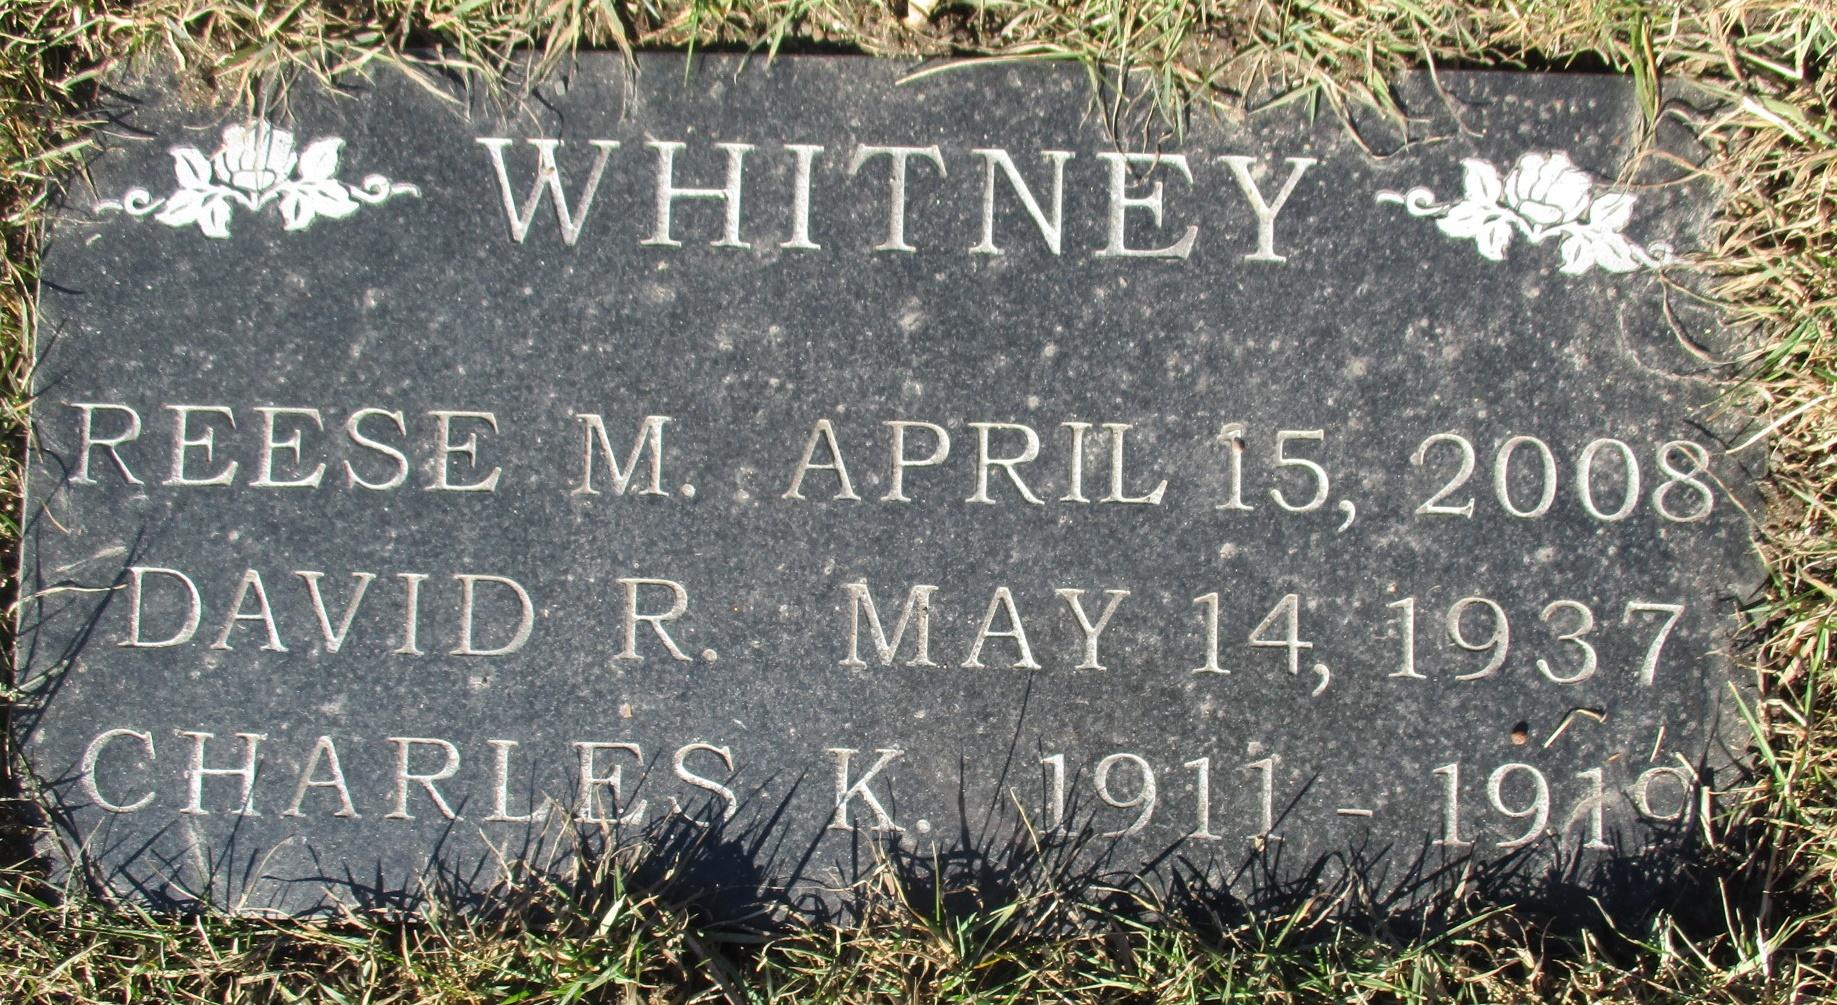 David R Whitney